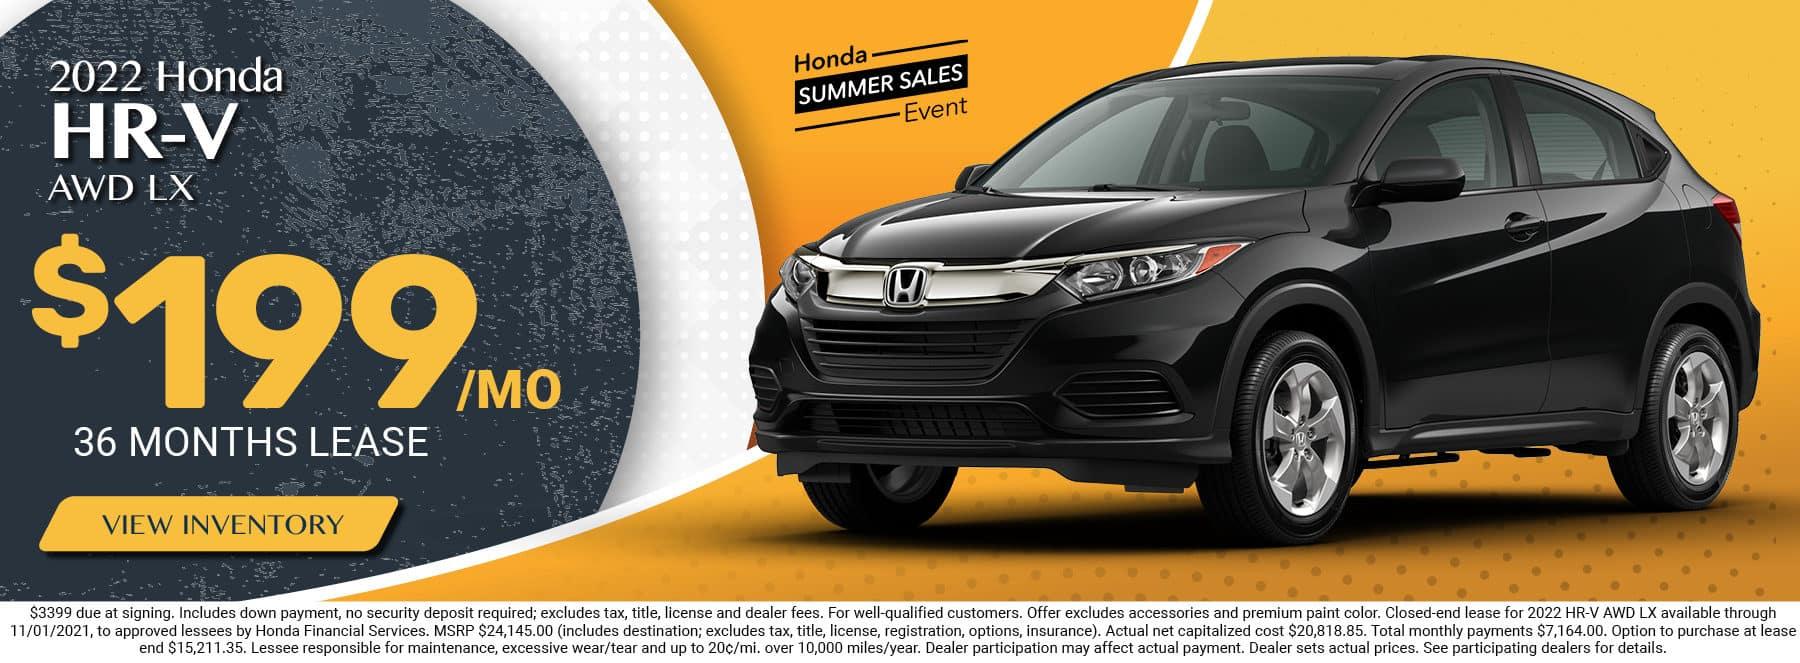 2022 Honda HR-V, AWD LX